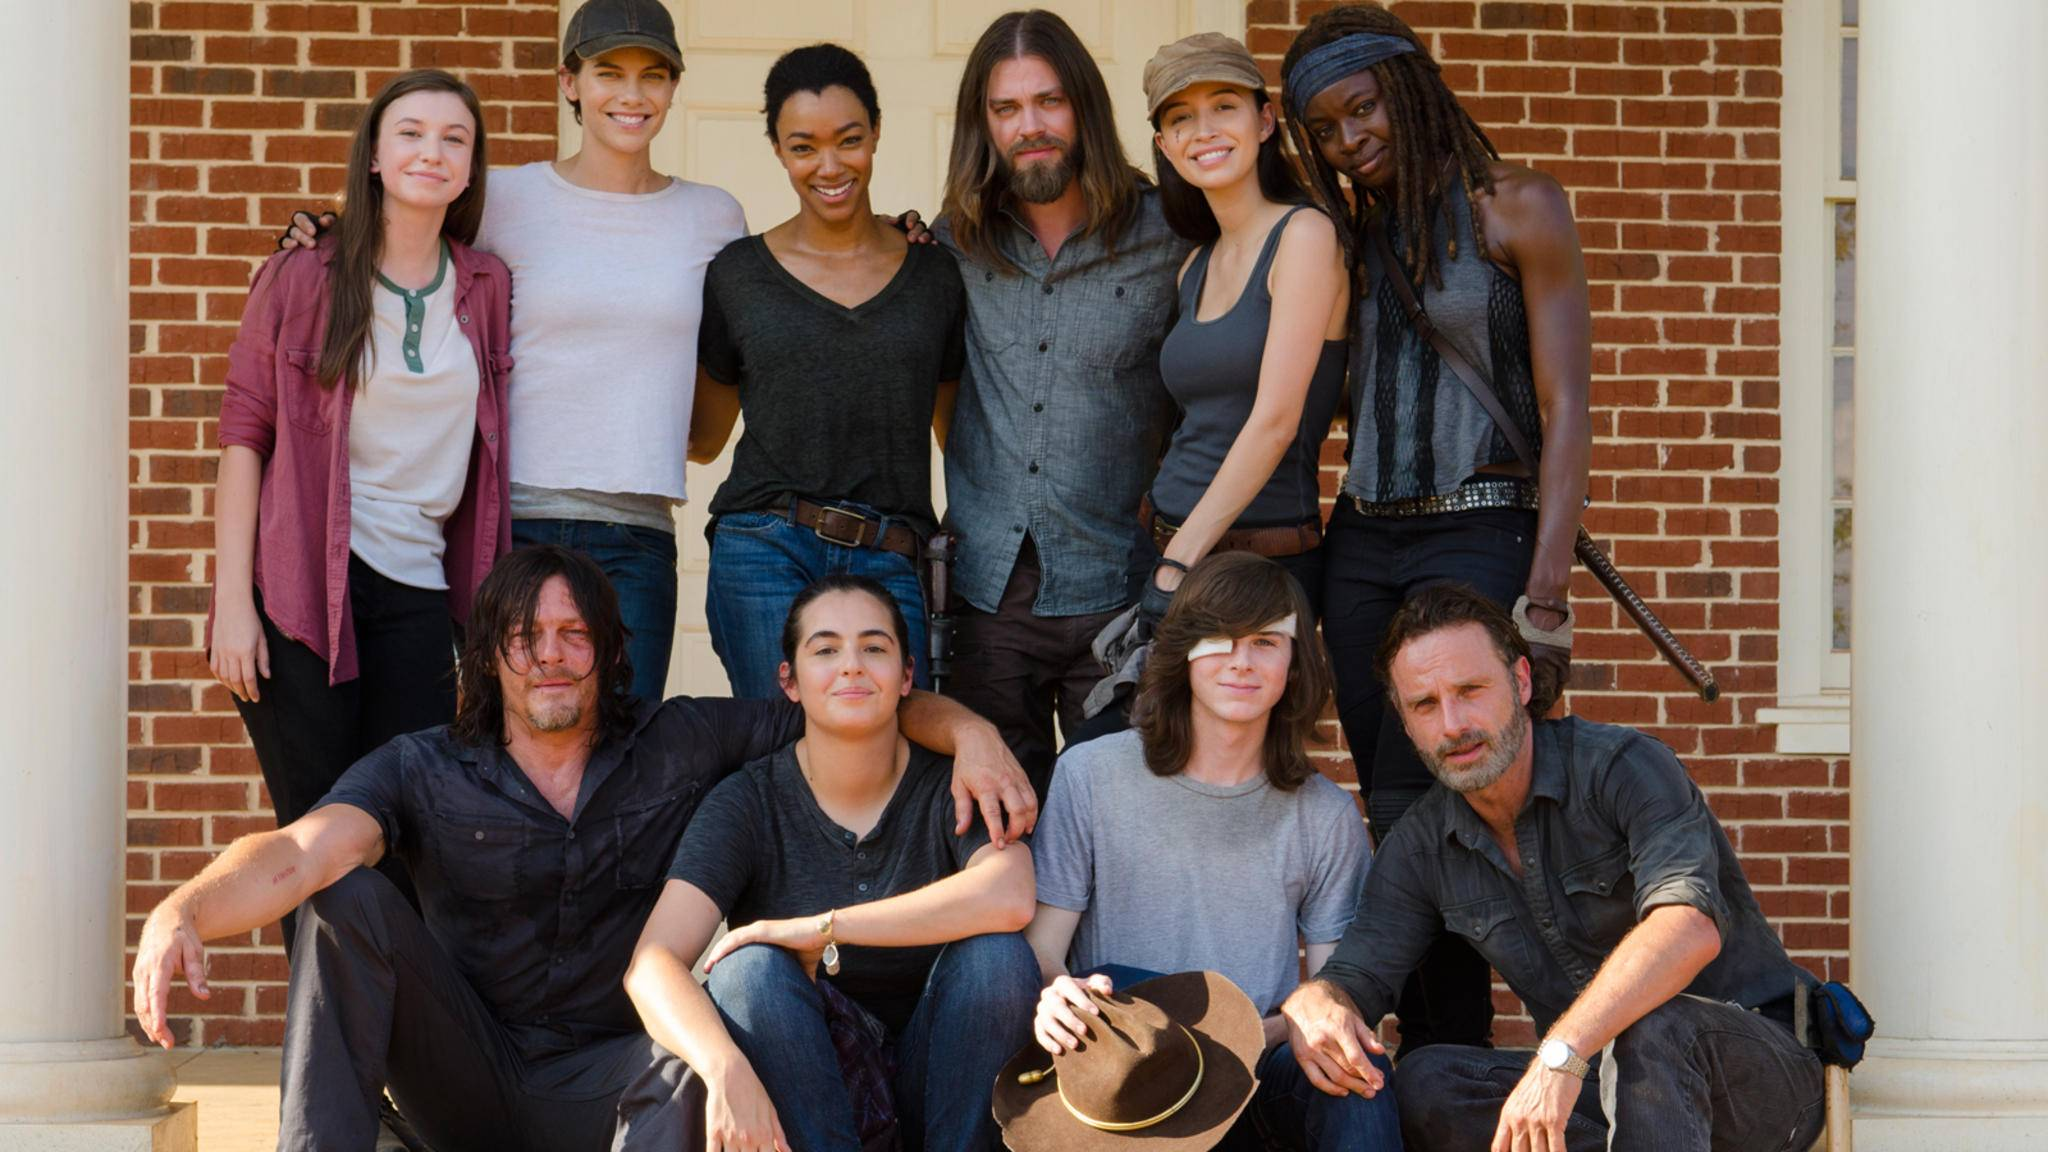 Schauspieler Walking Dead